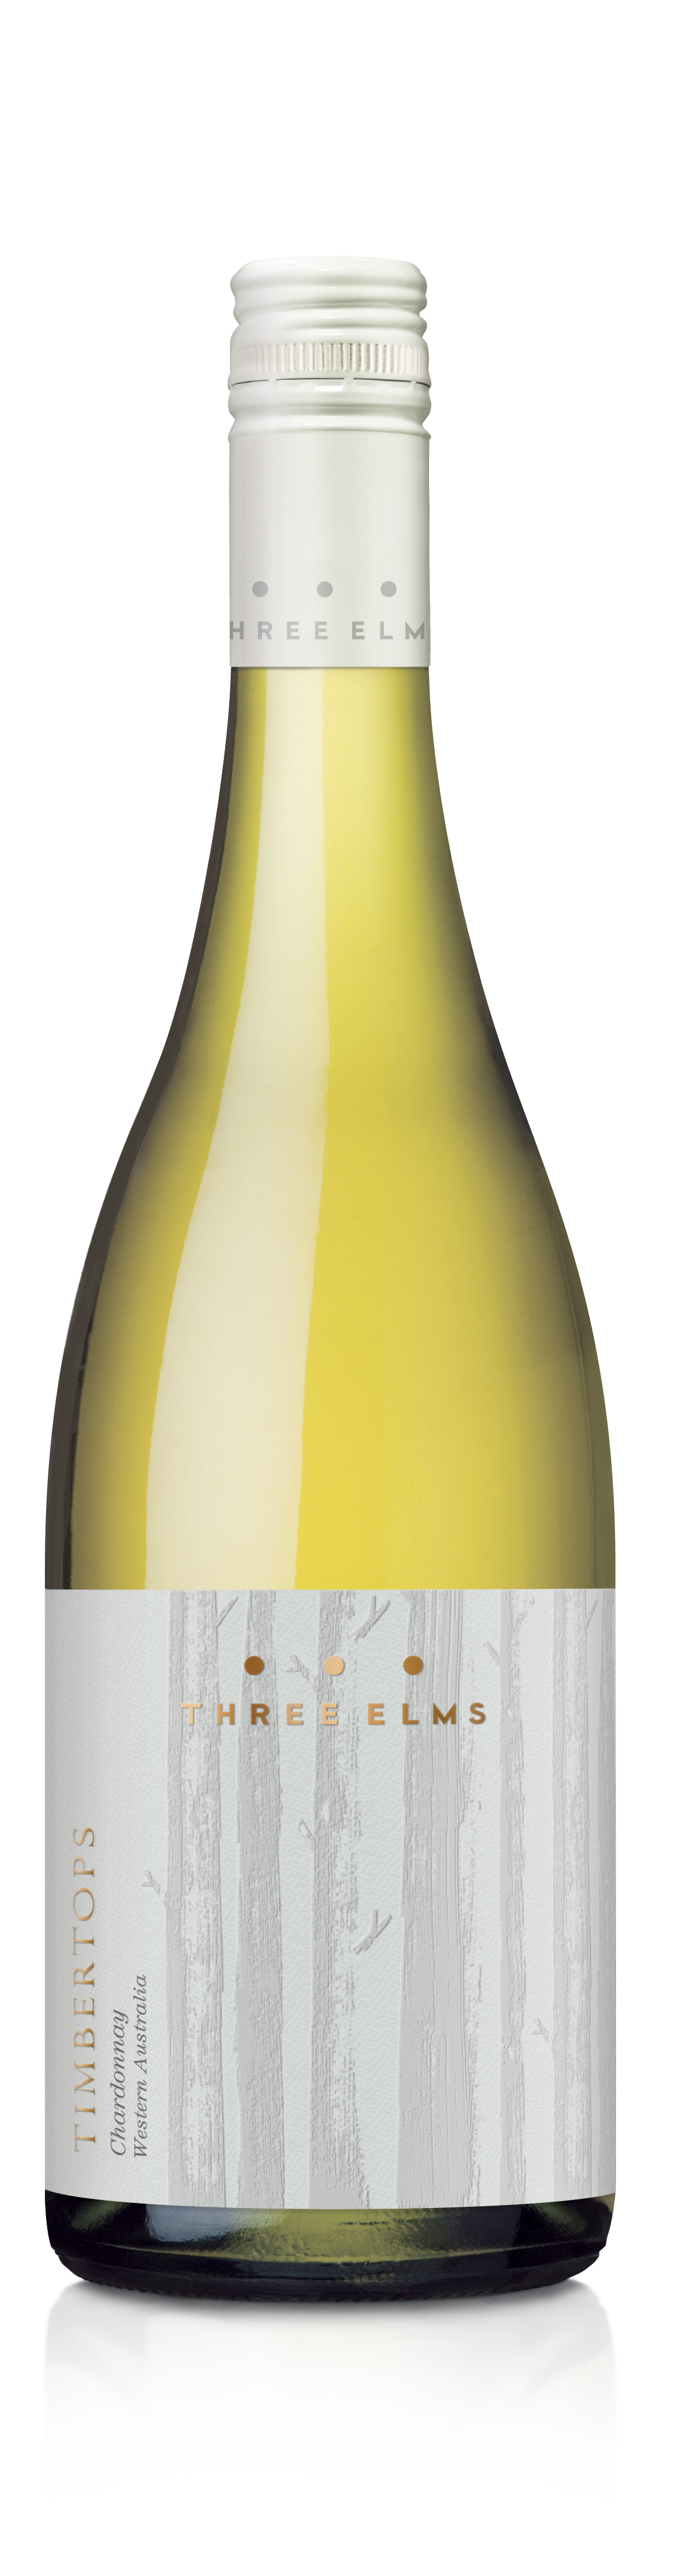 ThreeElms_Timbertops_Chardonnay[1].png